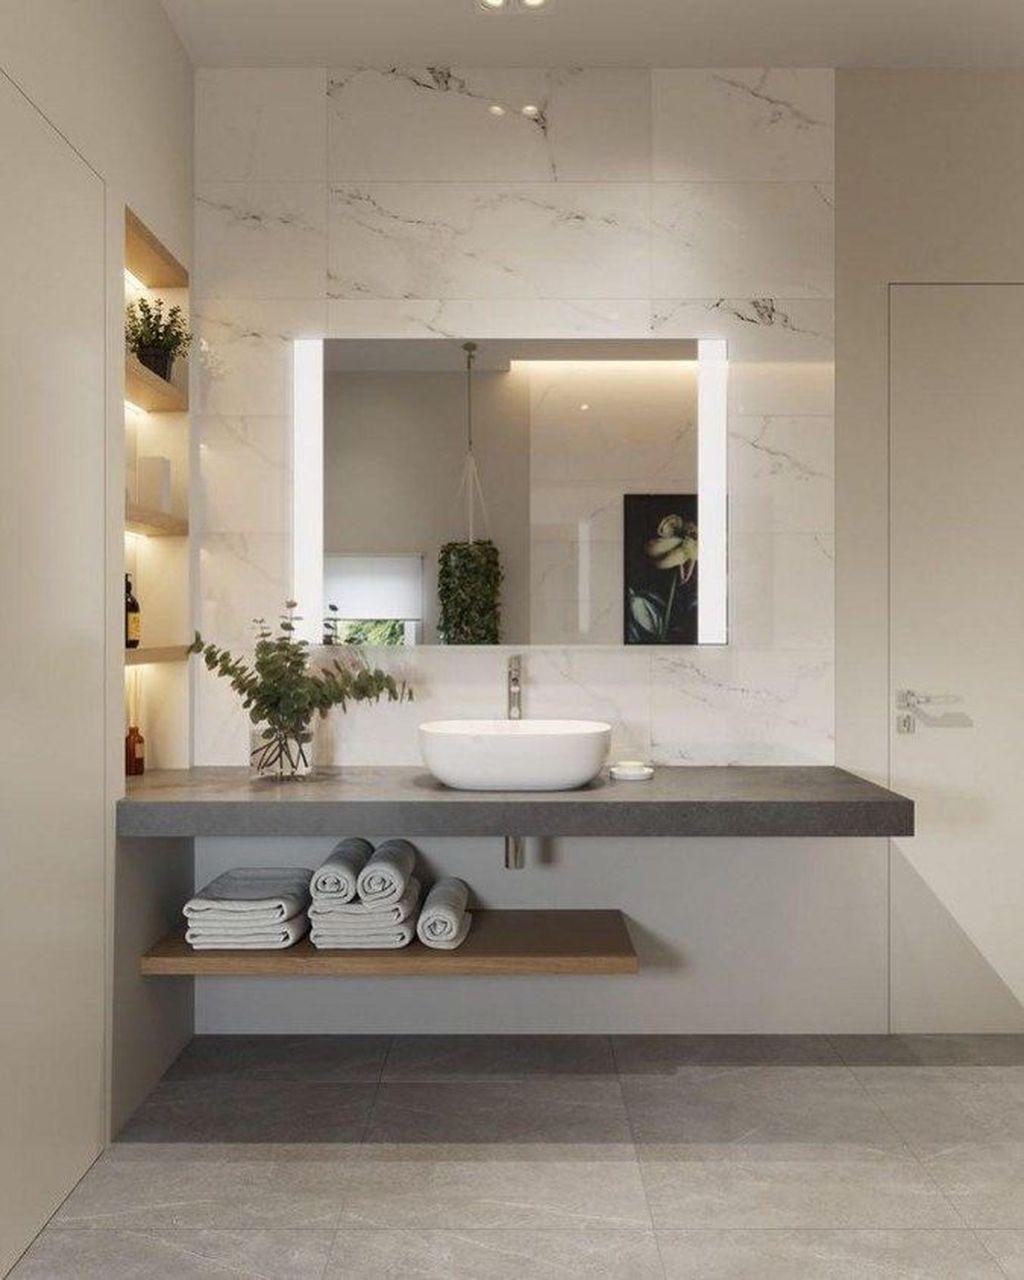 Latest Bathroom Design Ideas To Try Asap 34